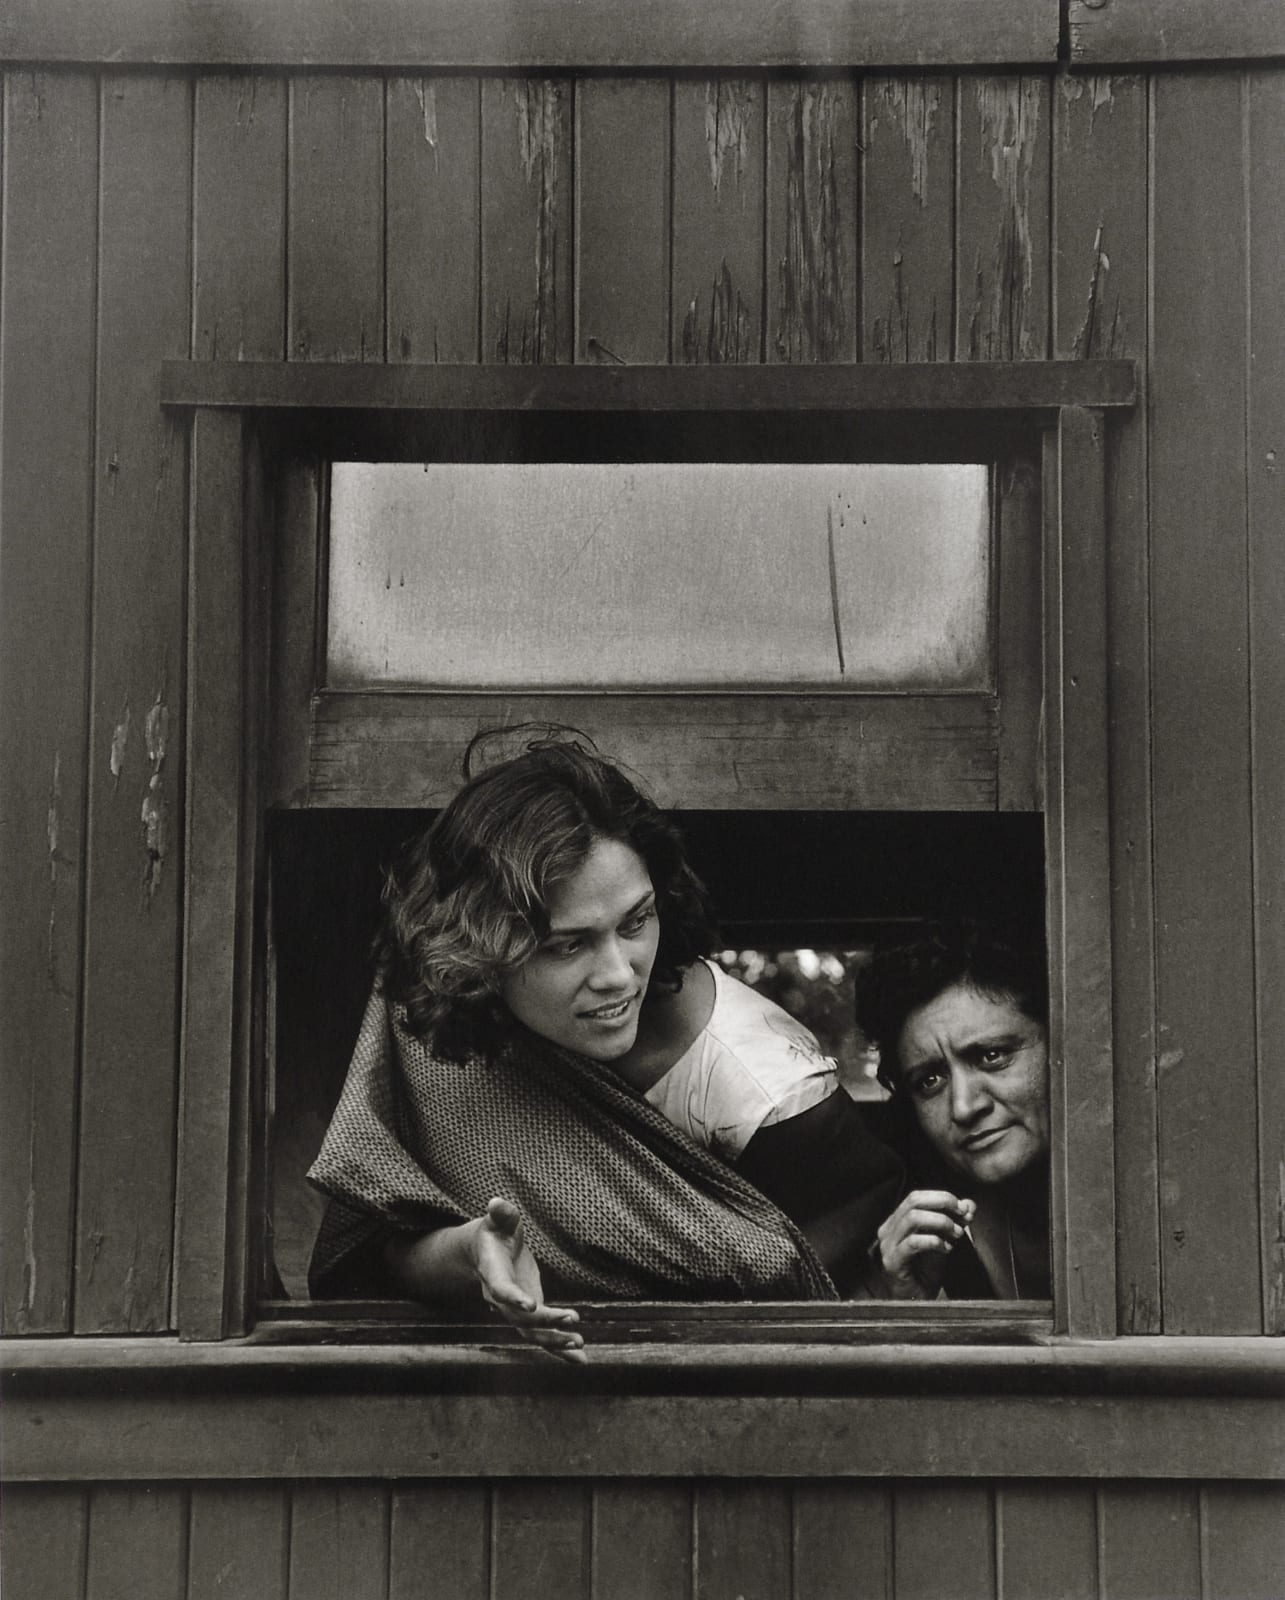 Rodrigo Moya - La Muchacha, Tren viejo México-Cuautla, 1966